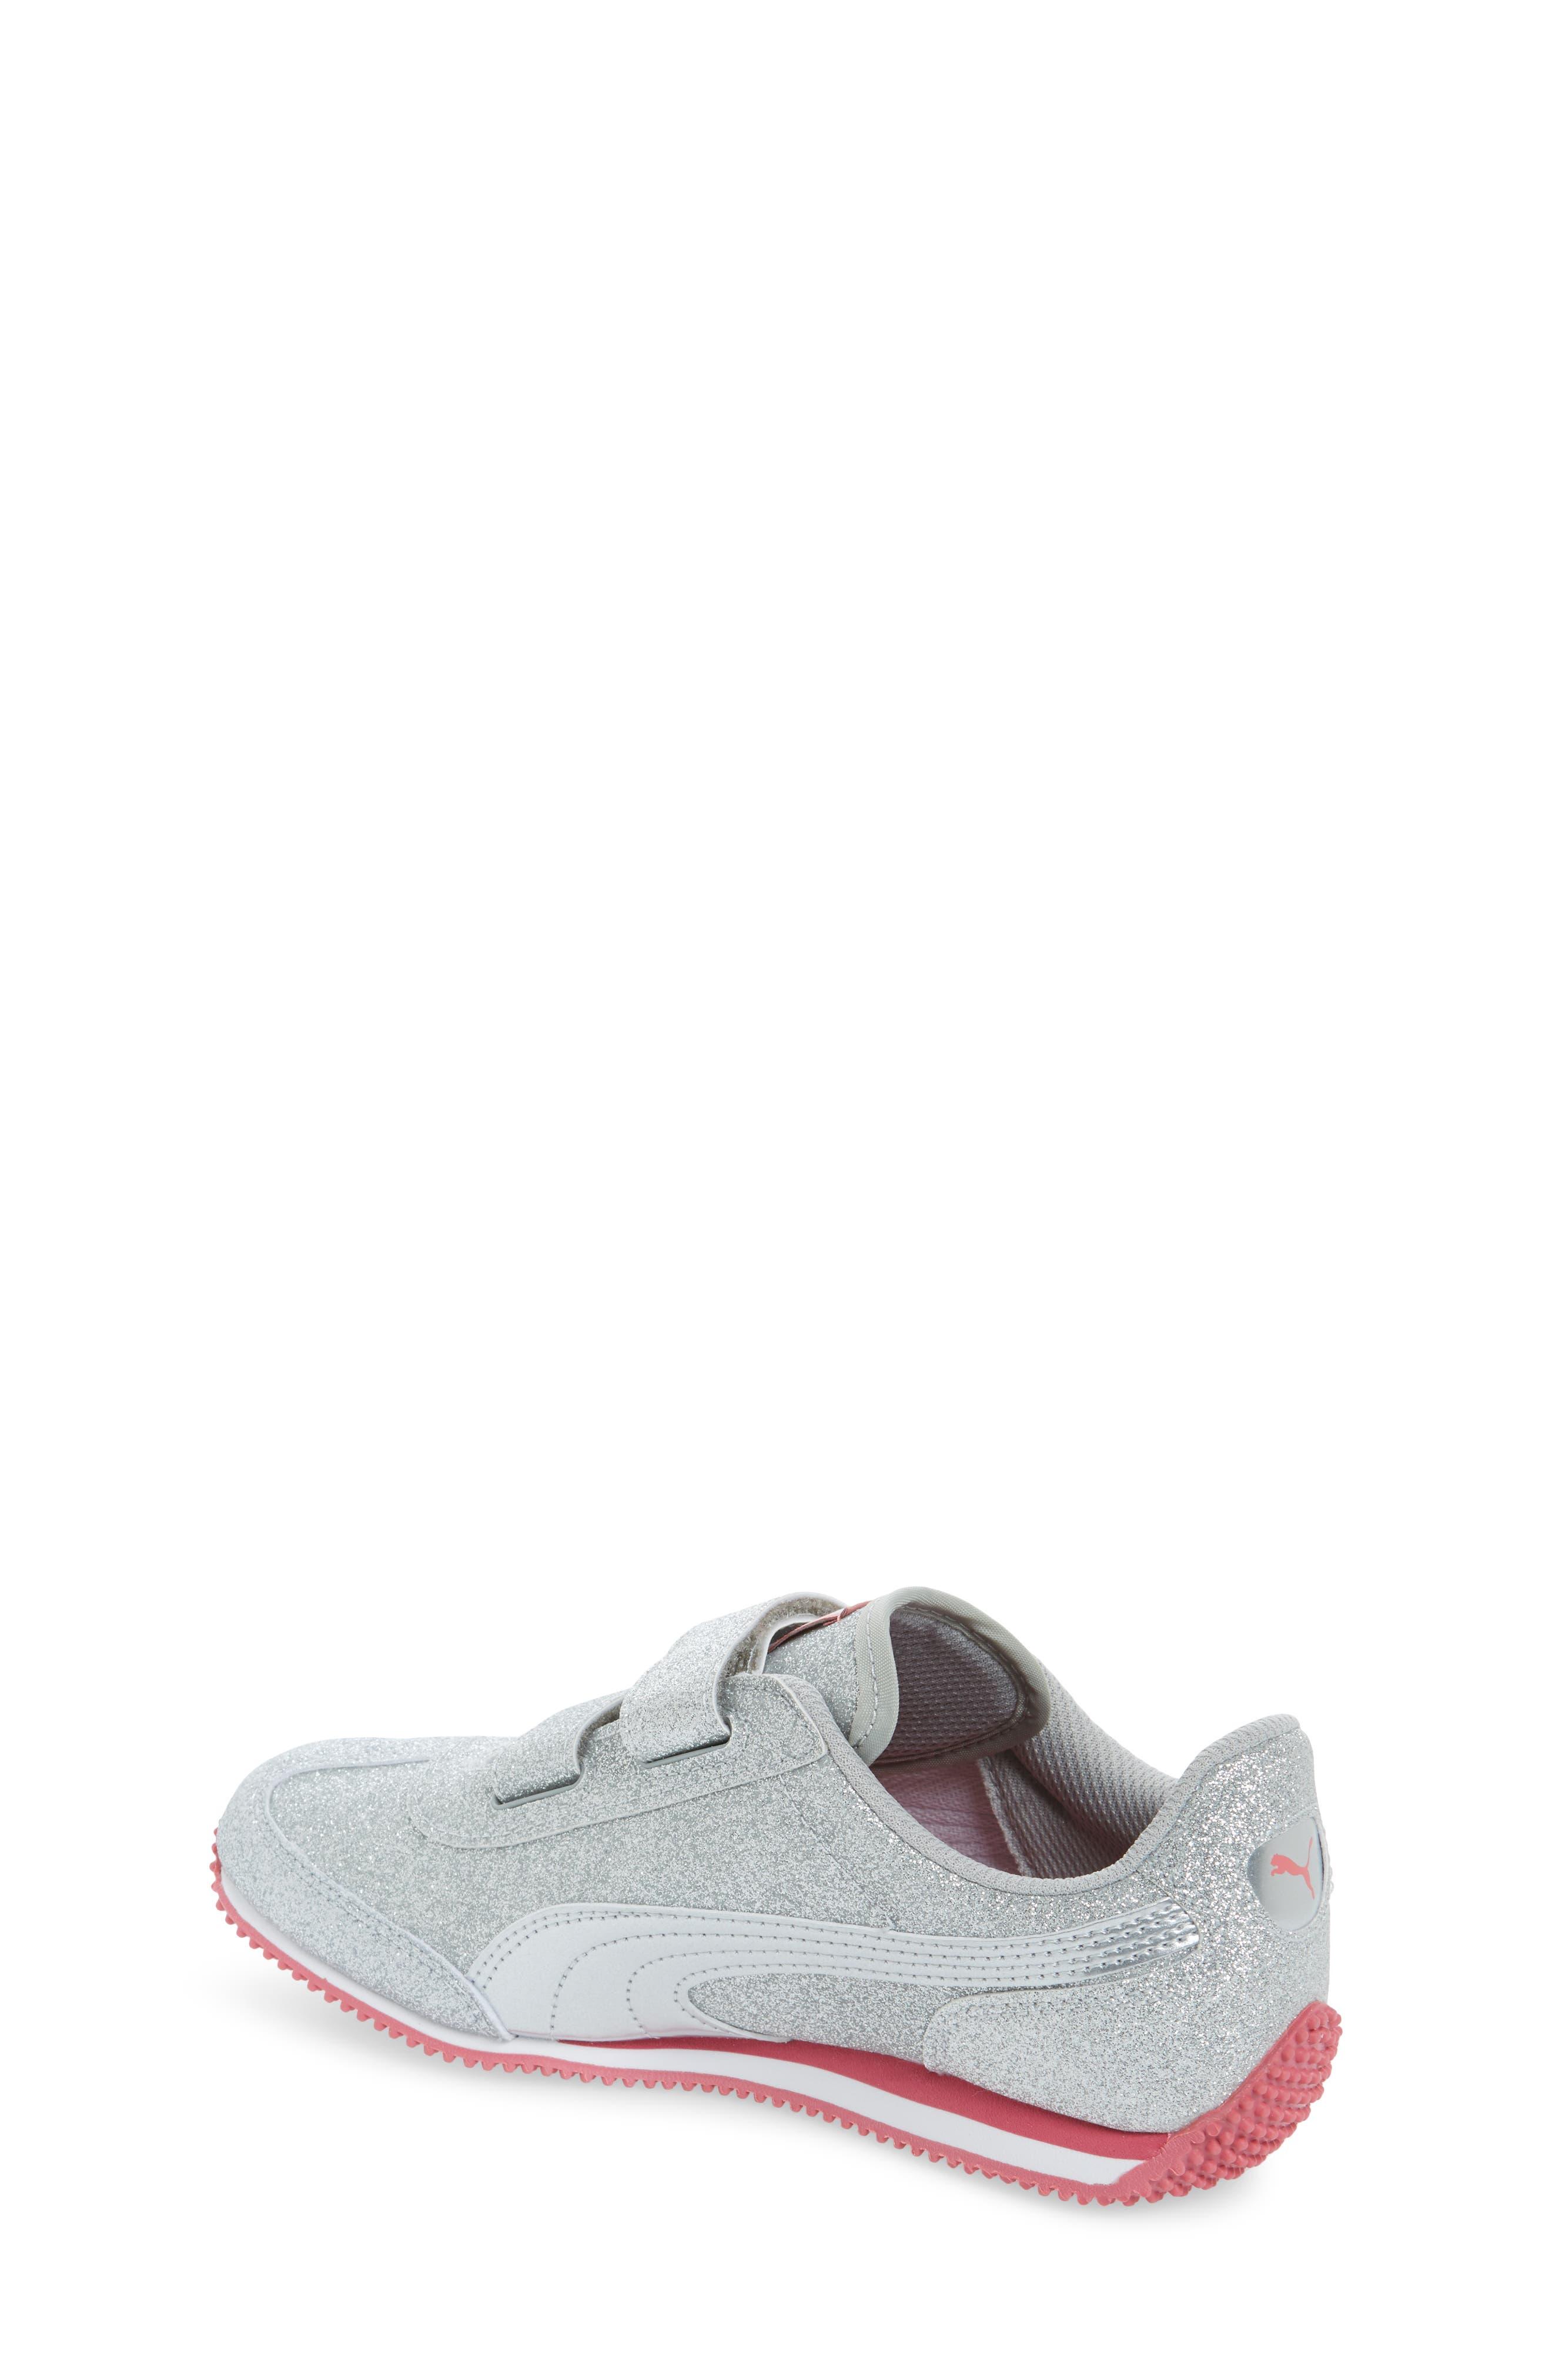 Alternate Image 2  - PUMA Whirlwind Glitz Sneaker (Toddler, Little Kid & Big Kid)